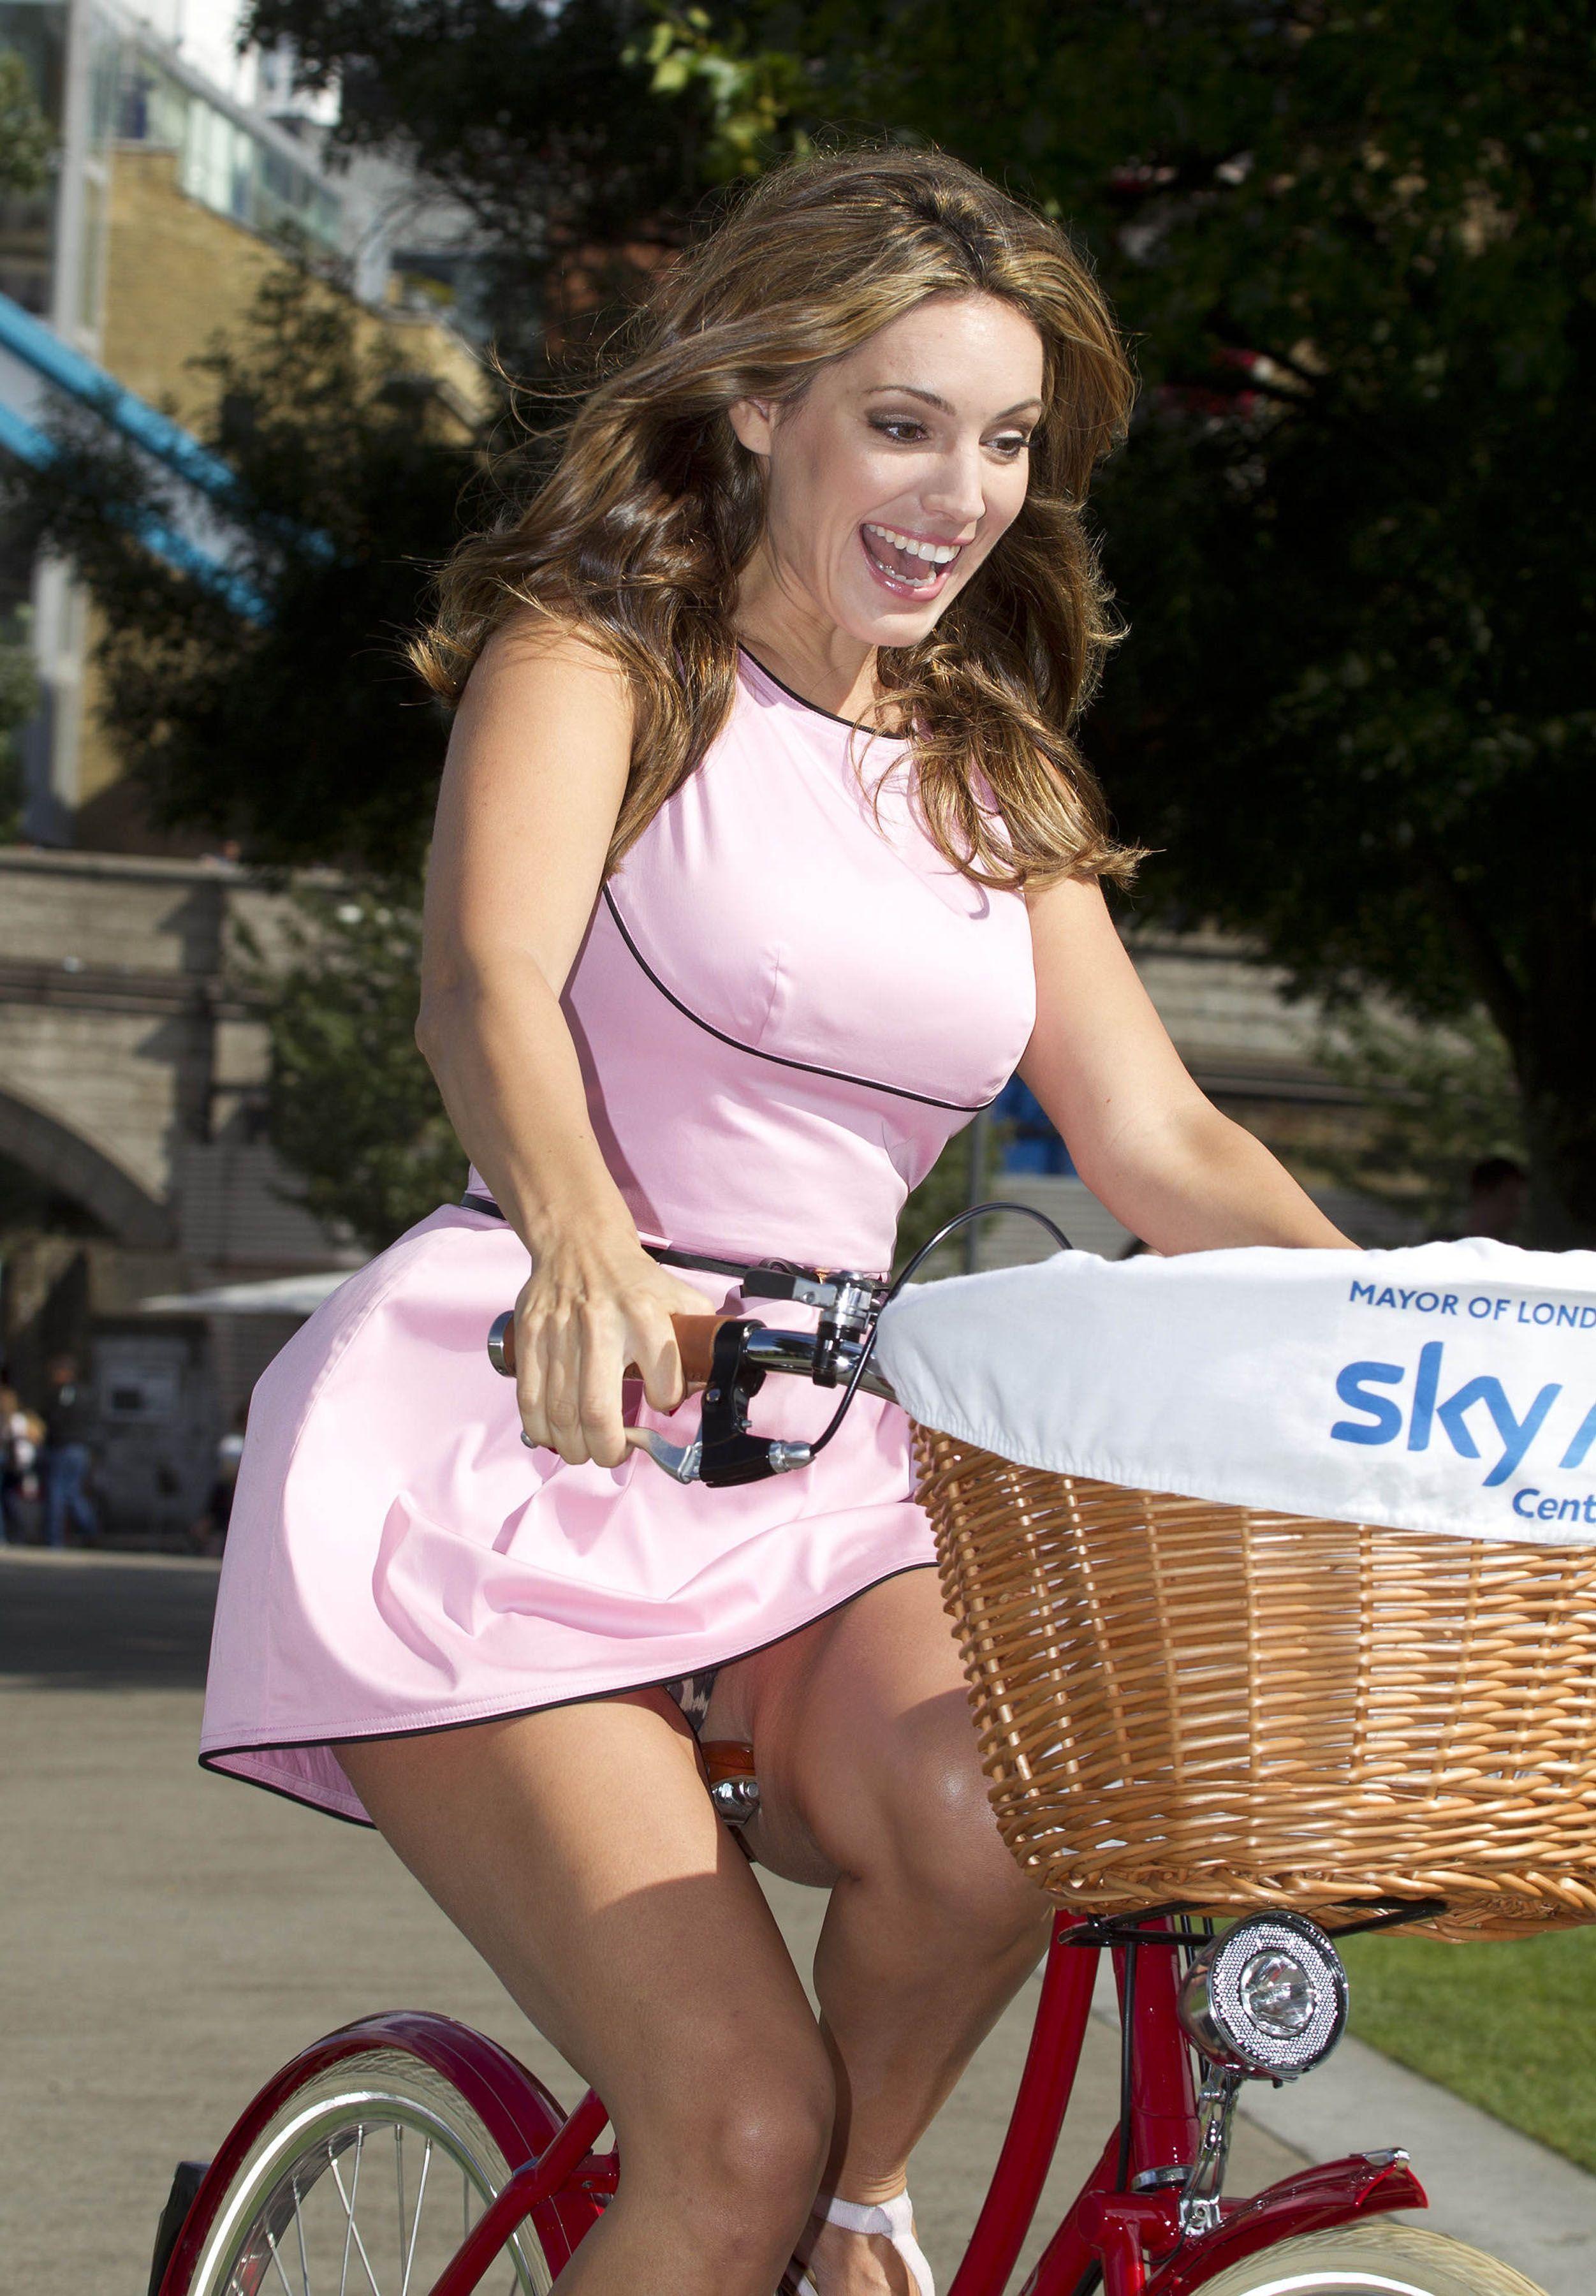 Upskirt Girls Riding Bikes With Skirts  Hot Girl Hd Wallpaper-5986